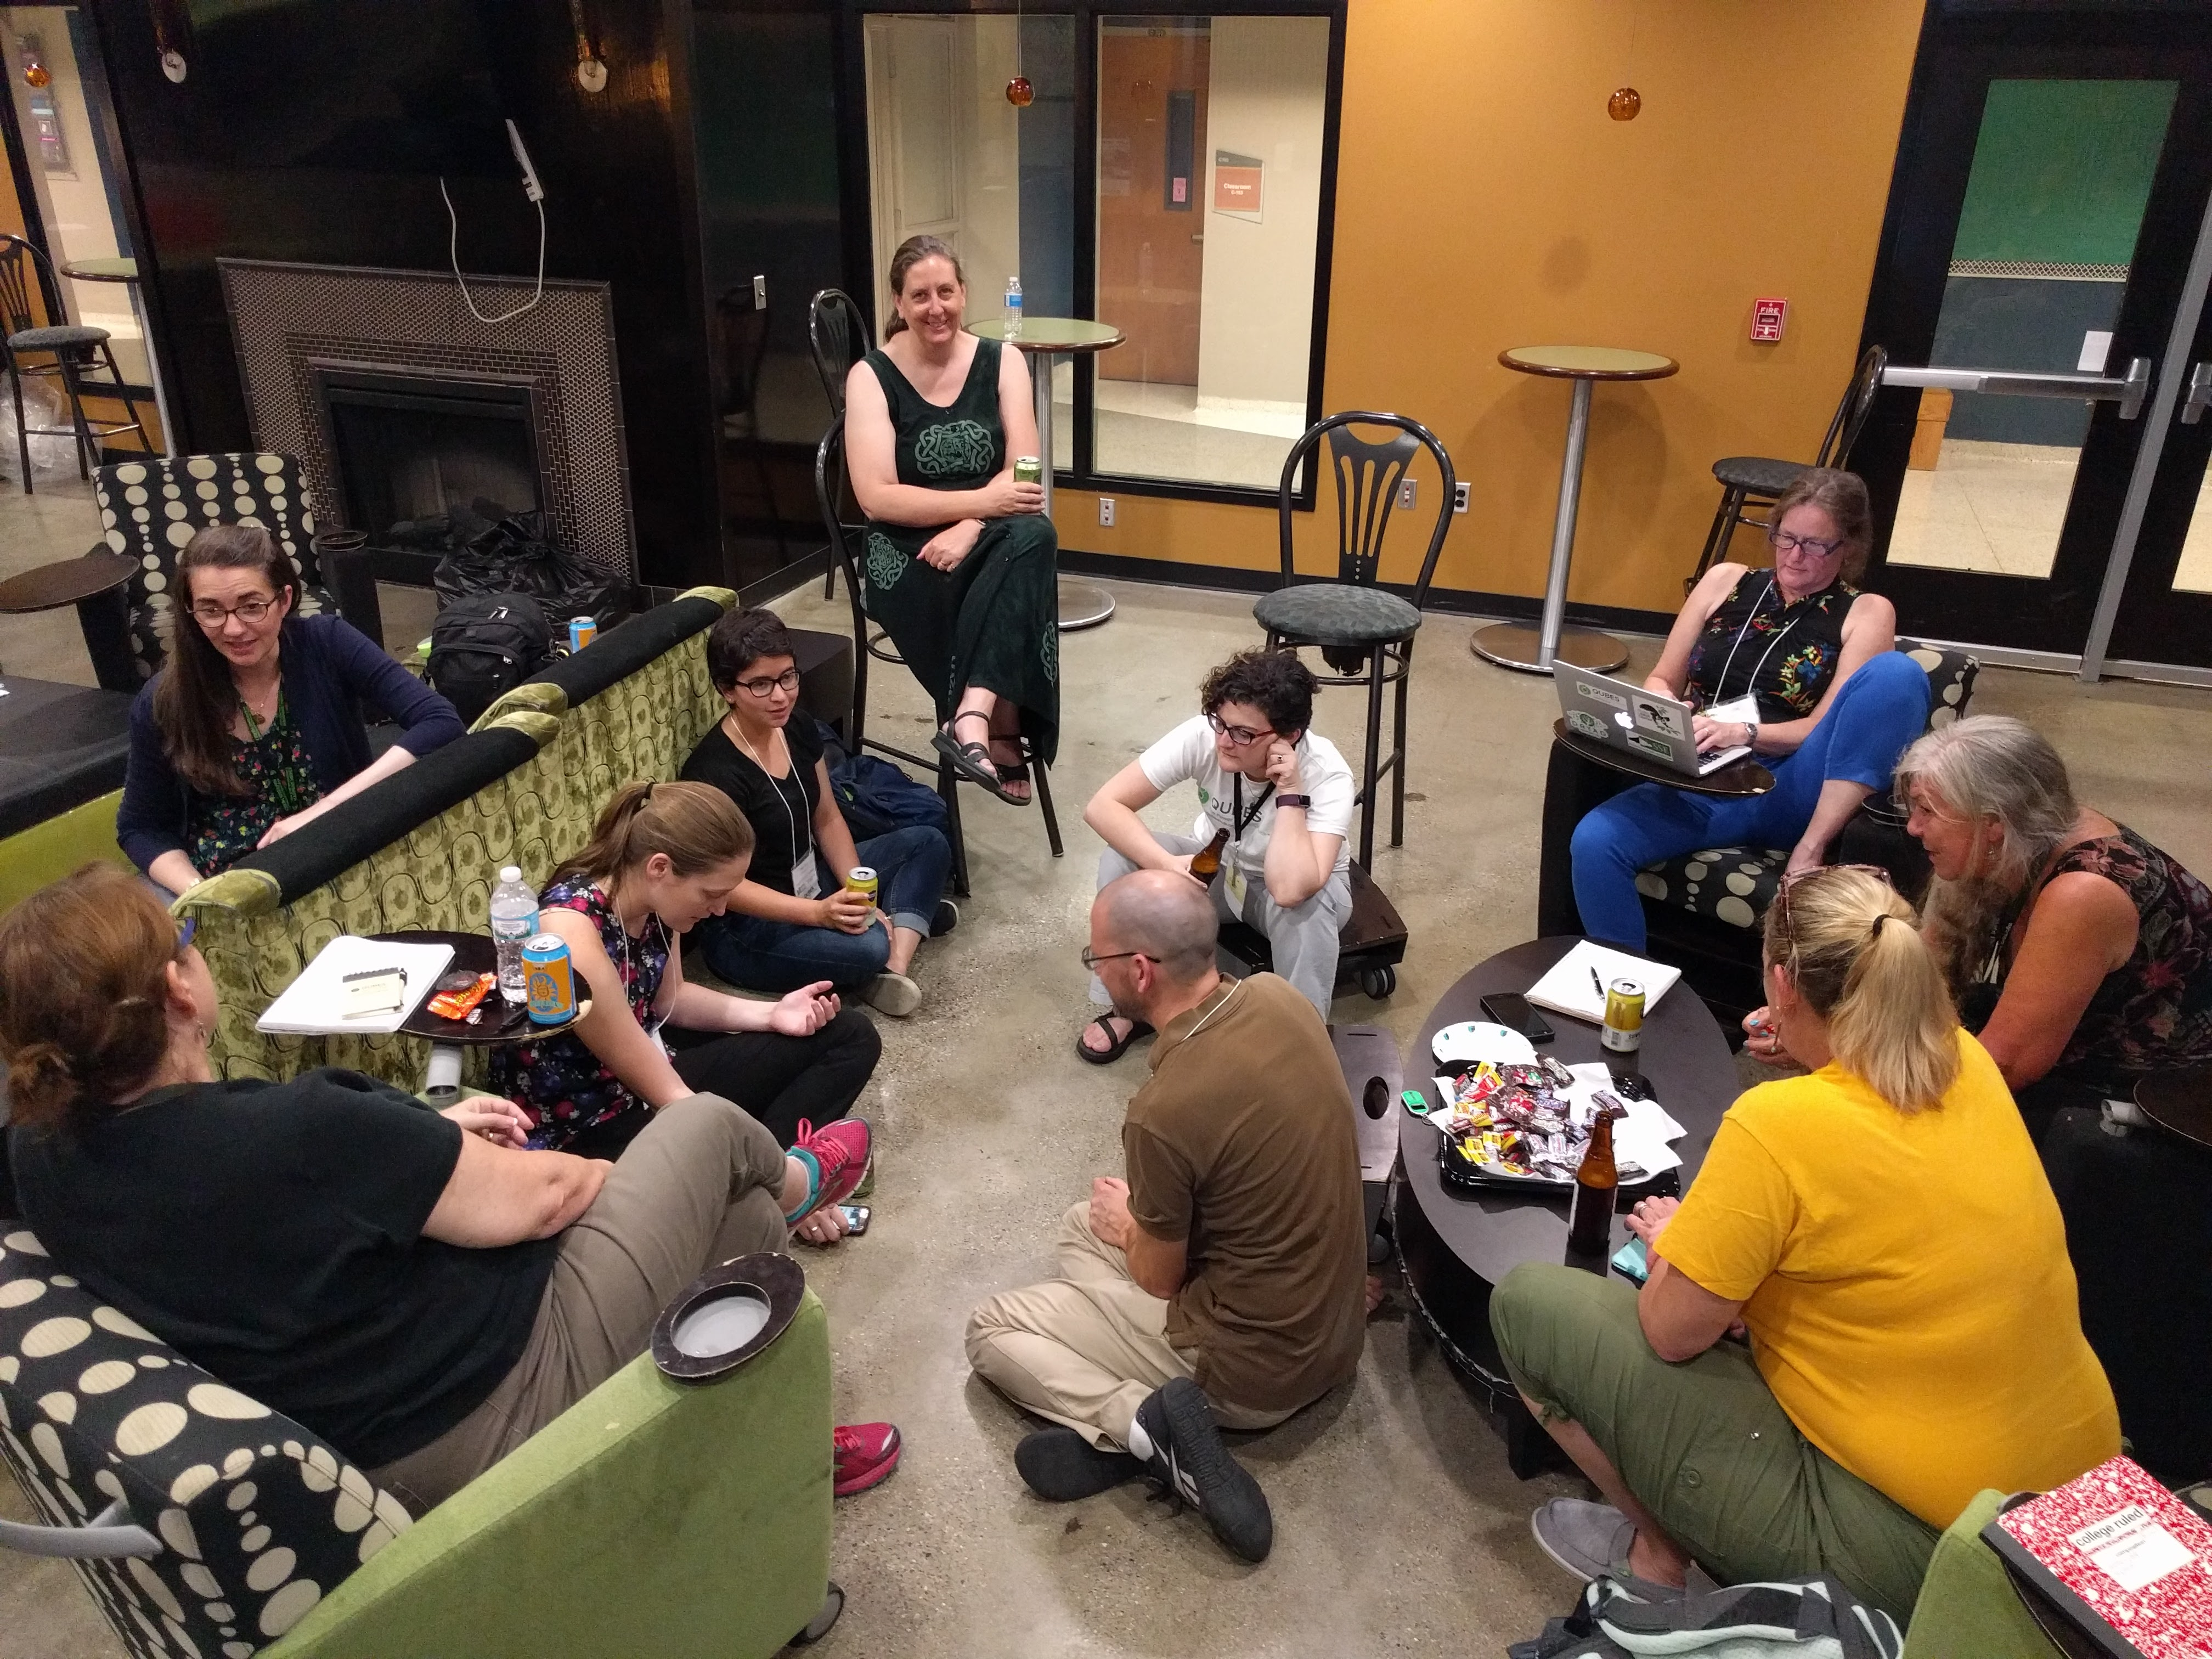 group sitting on floor